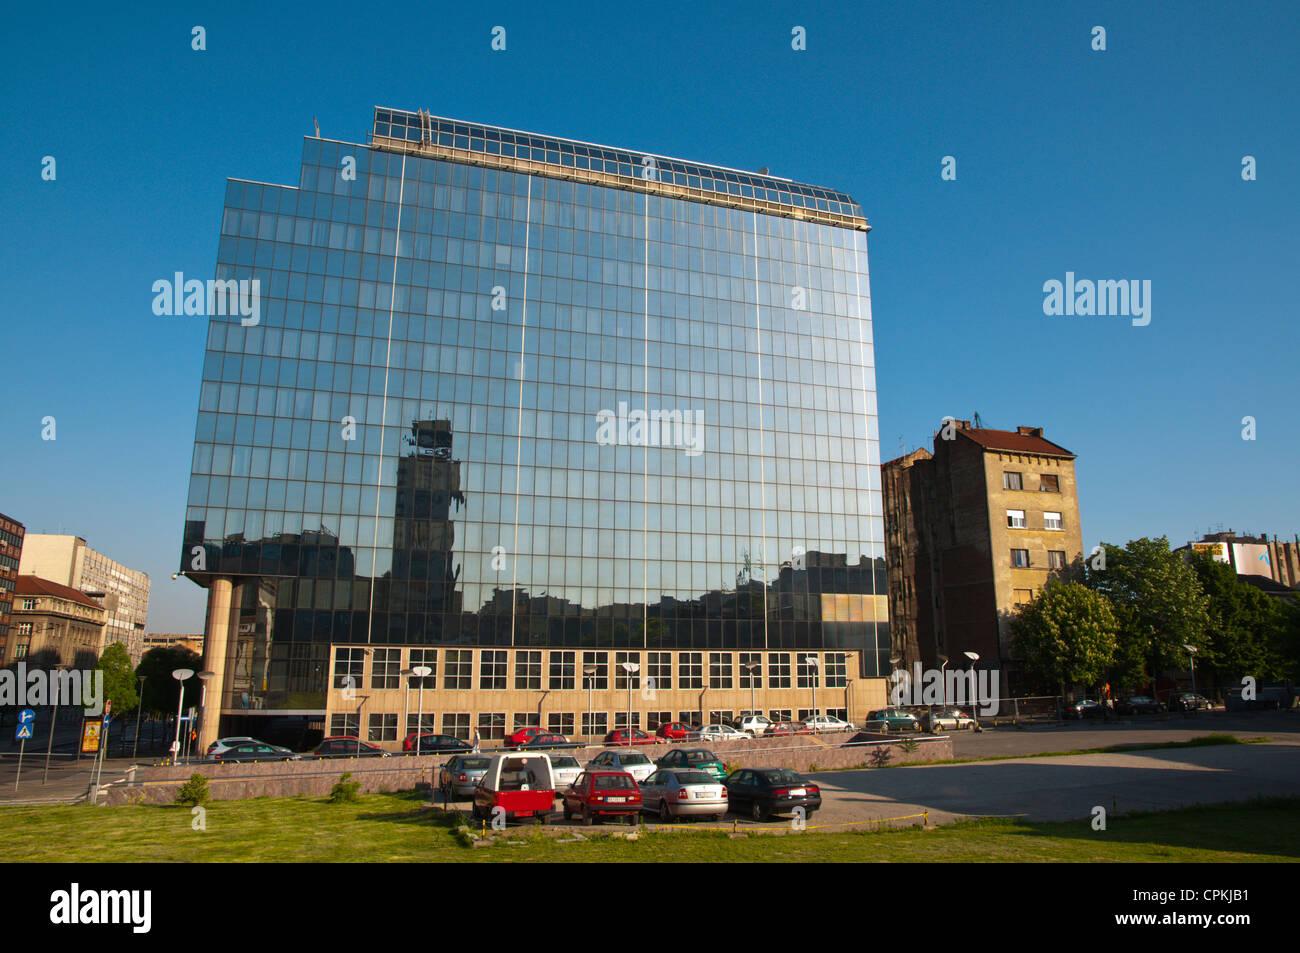 New Serbian National Bank building at Finanskije Park along Nemanjina street central Belgrade Serbia Europe - Stock Image